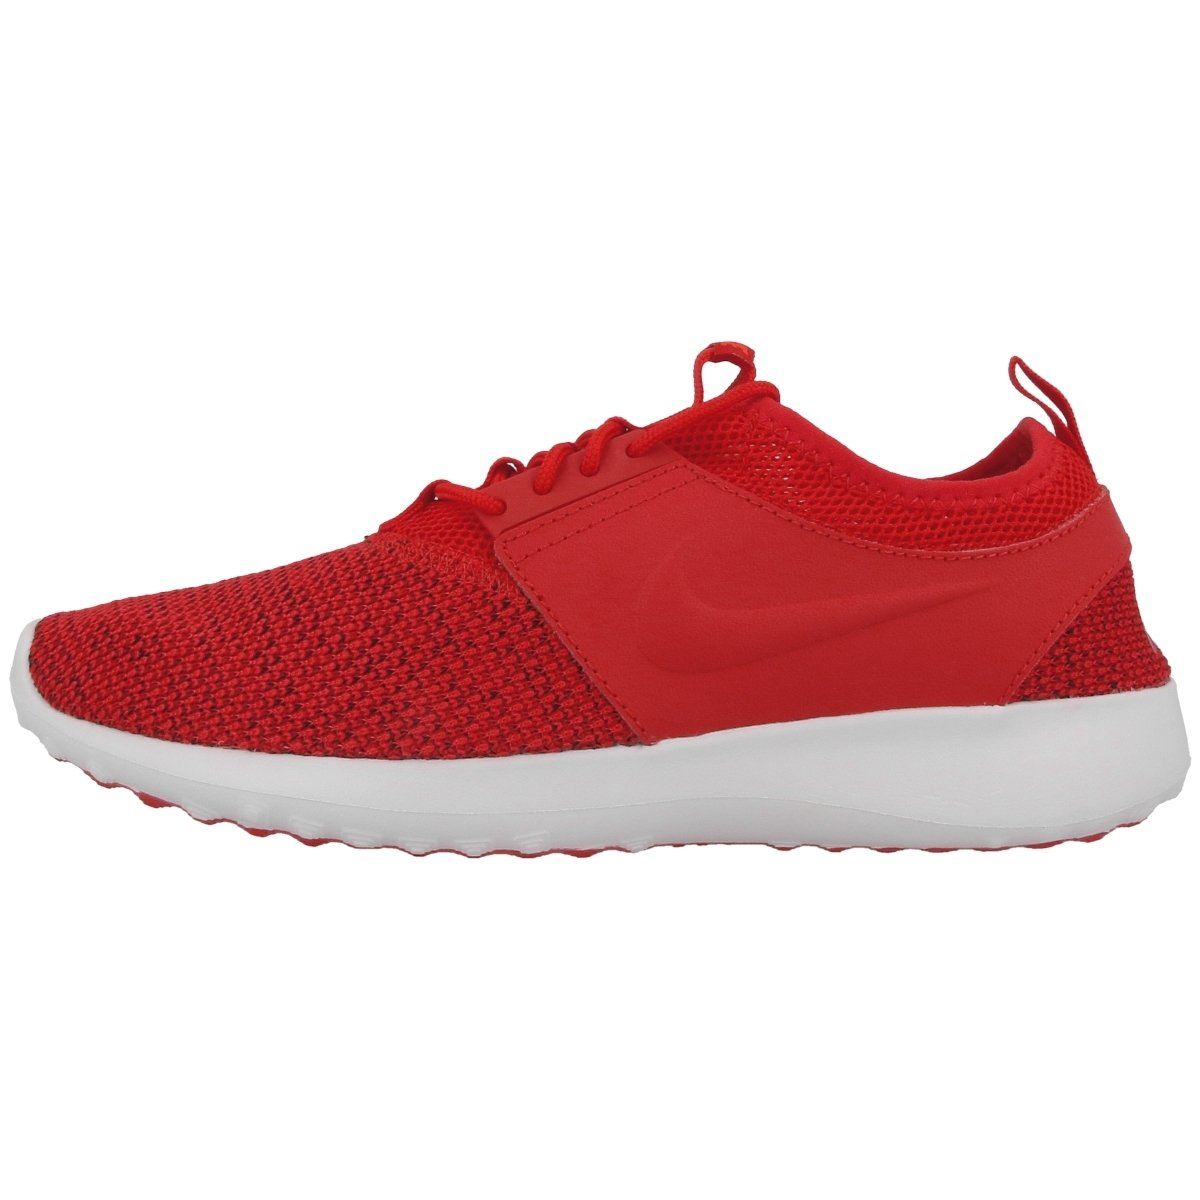 Nike Juvenate TXT WMNS Schuhe Damen Turnschuhe Sportschuhe Rot 807423 600